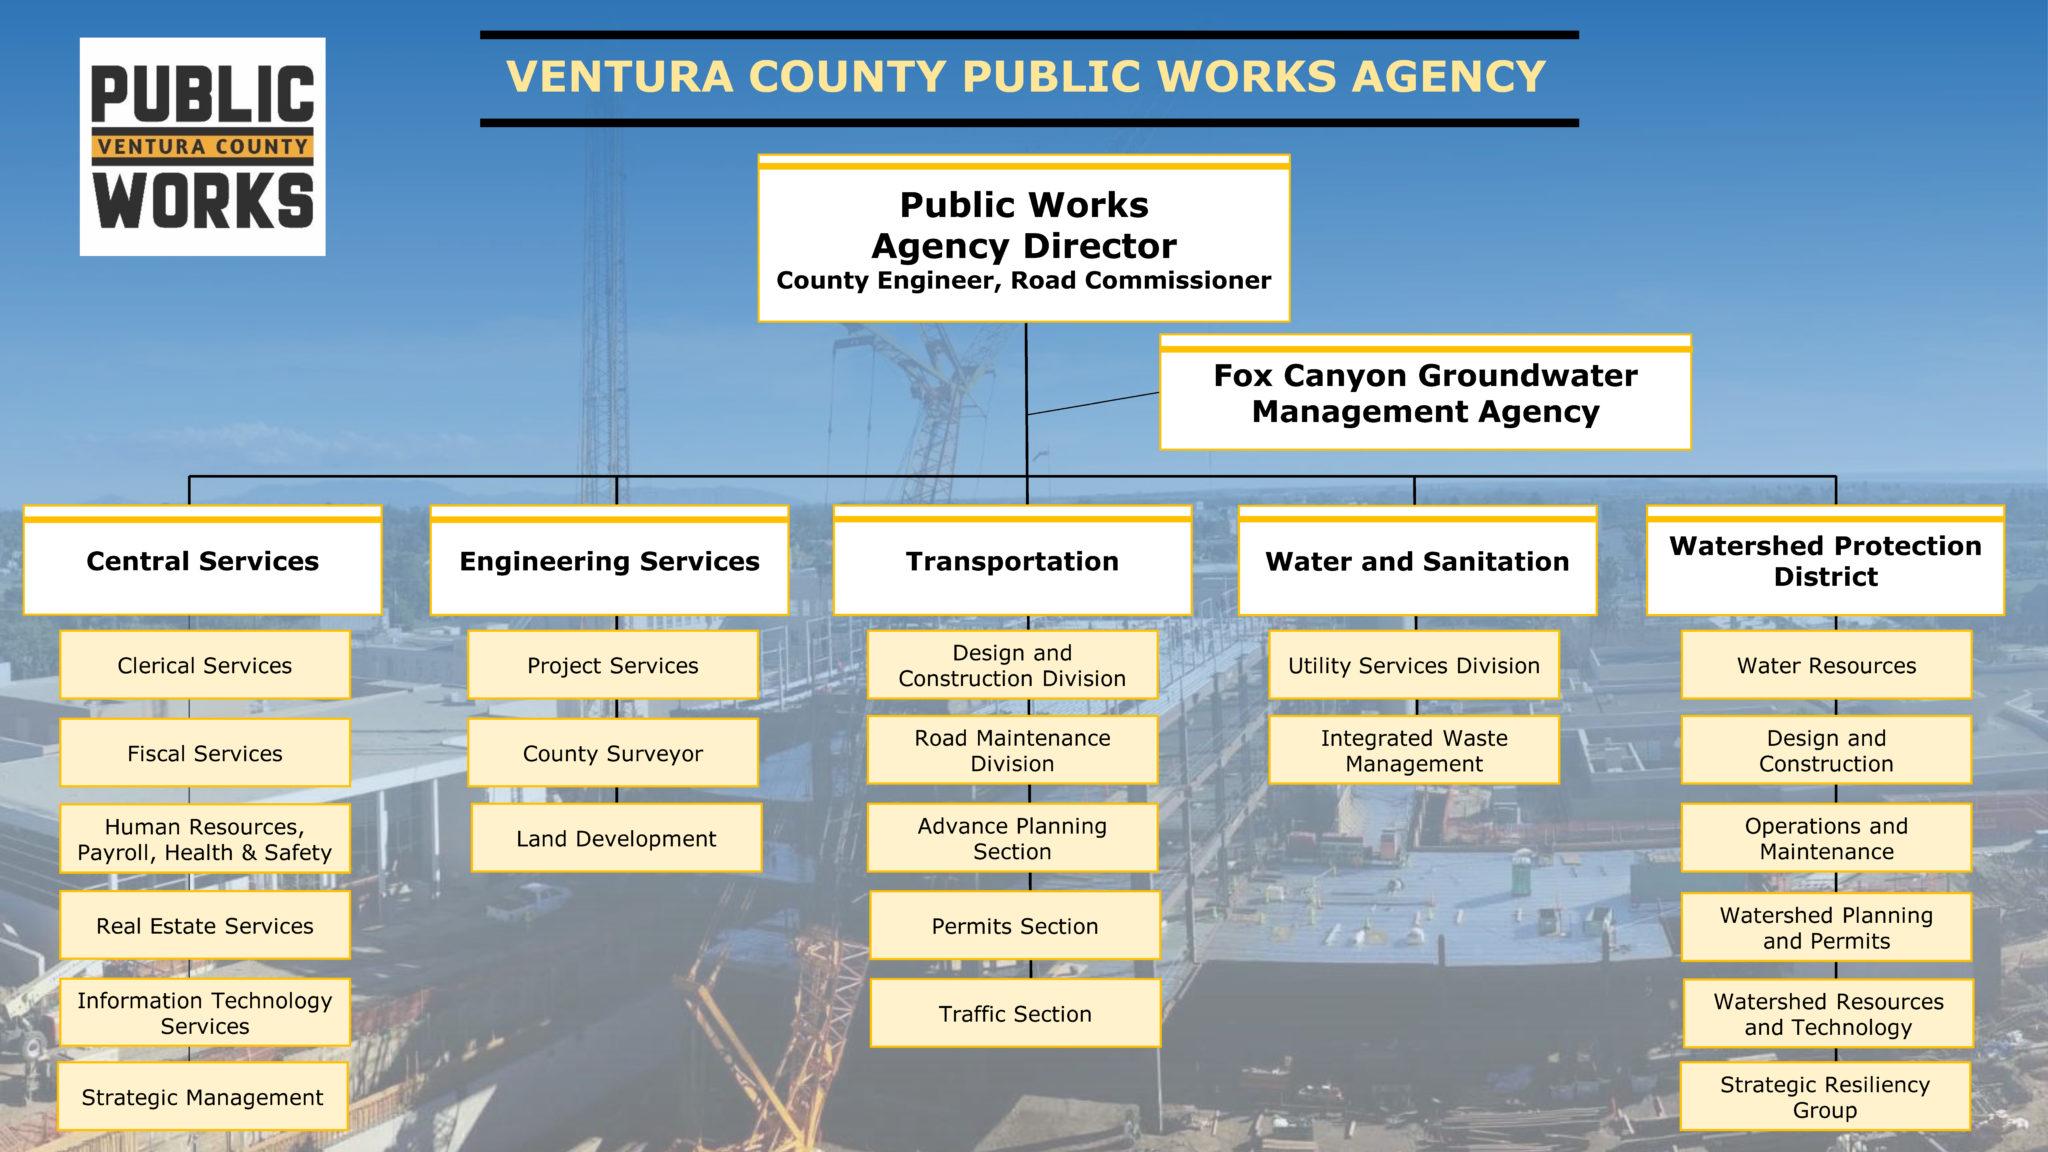 Ventura County Public Works Agency